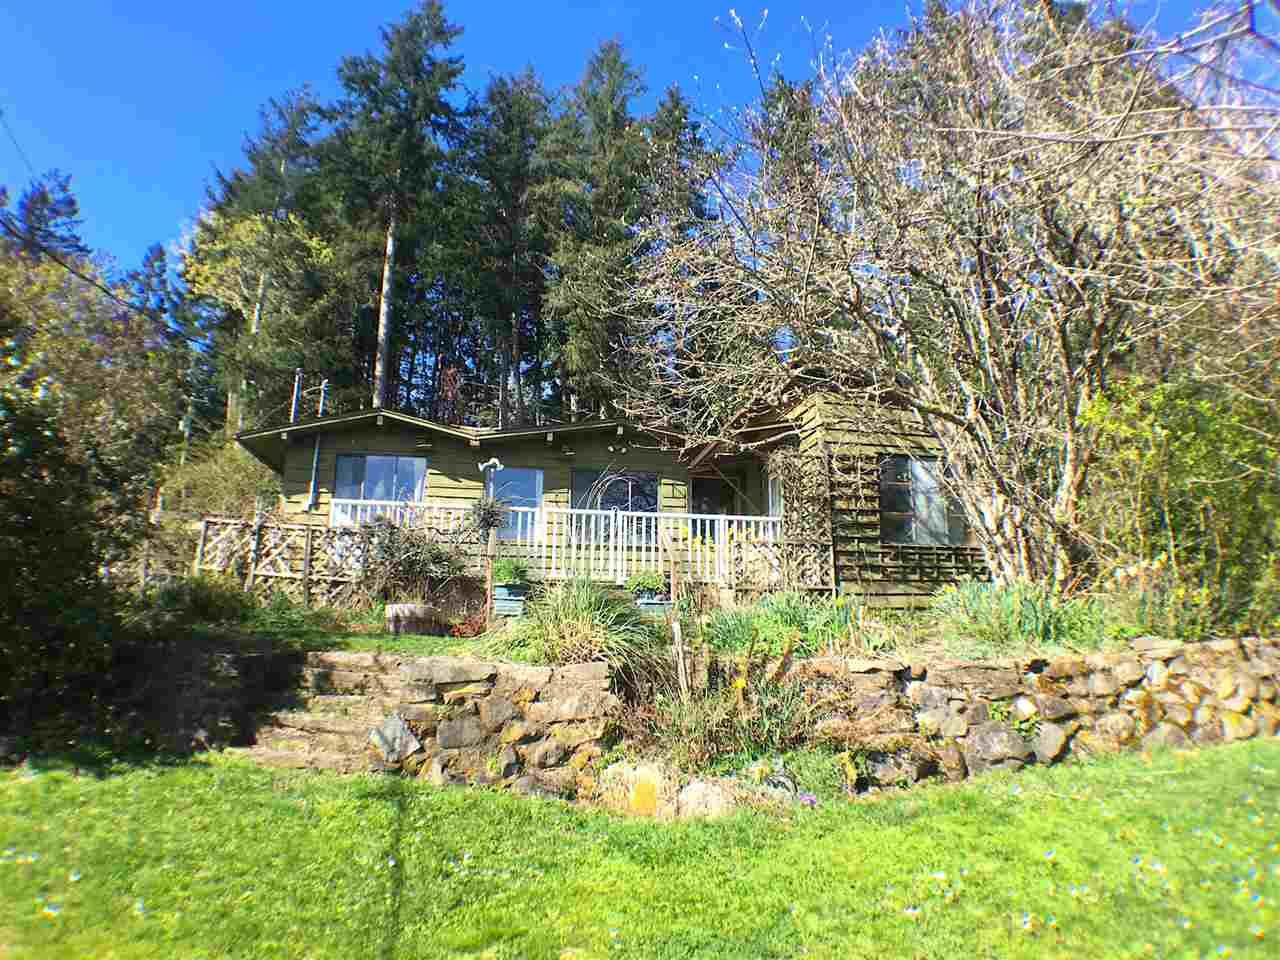 Main Photo: 160 MONTAGUE Road: Galiano Island House for sale (Islands-Van. & Gulf)  : MLS®# R2489817